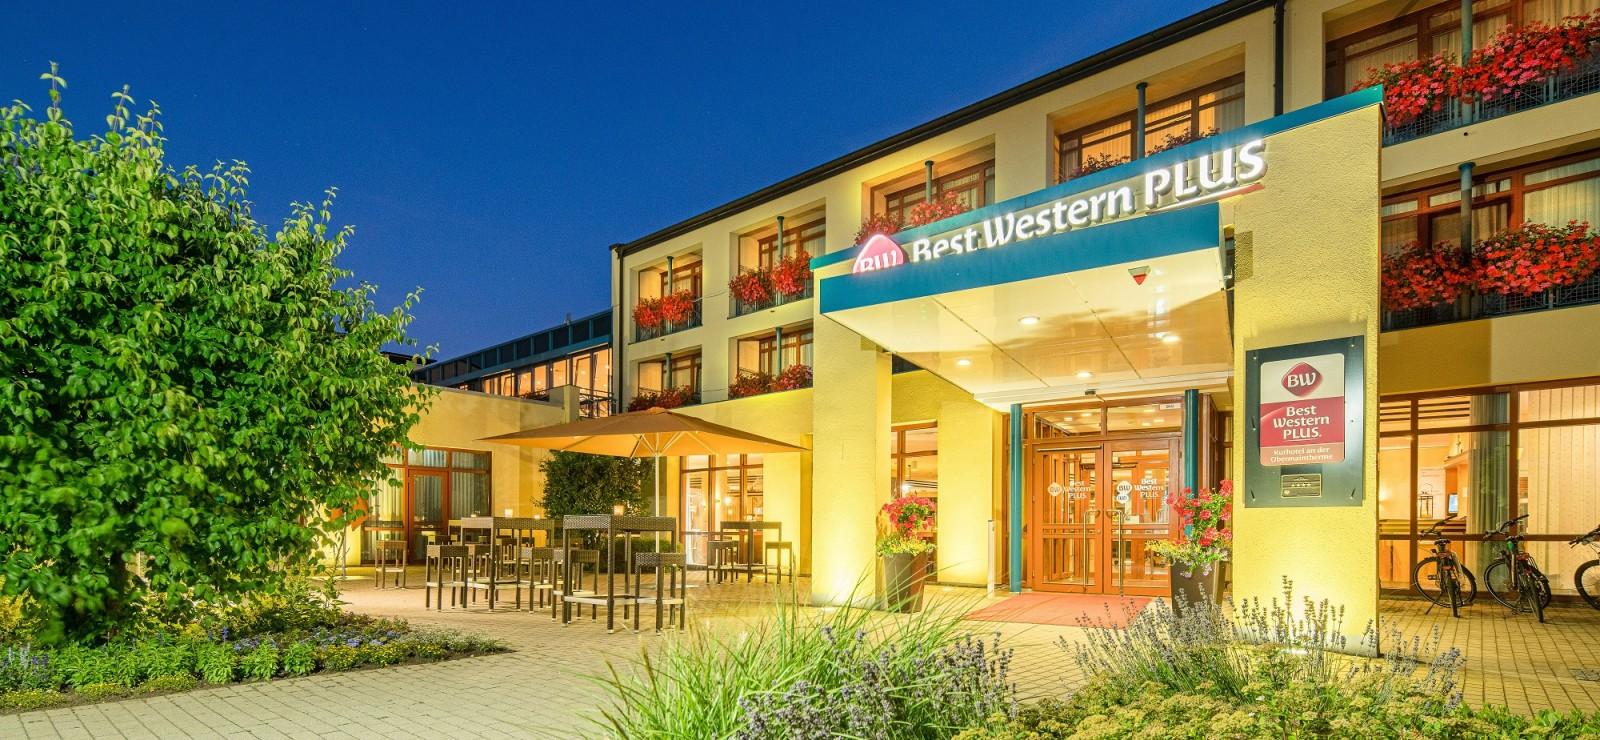 Best Western Plus Kurhotel an der Obermaintherme Bilder | Bild 1